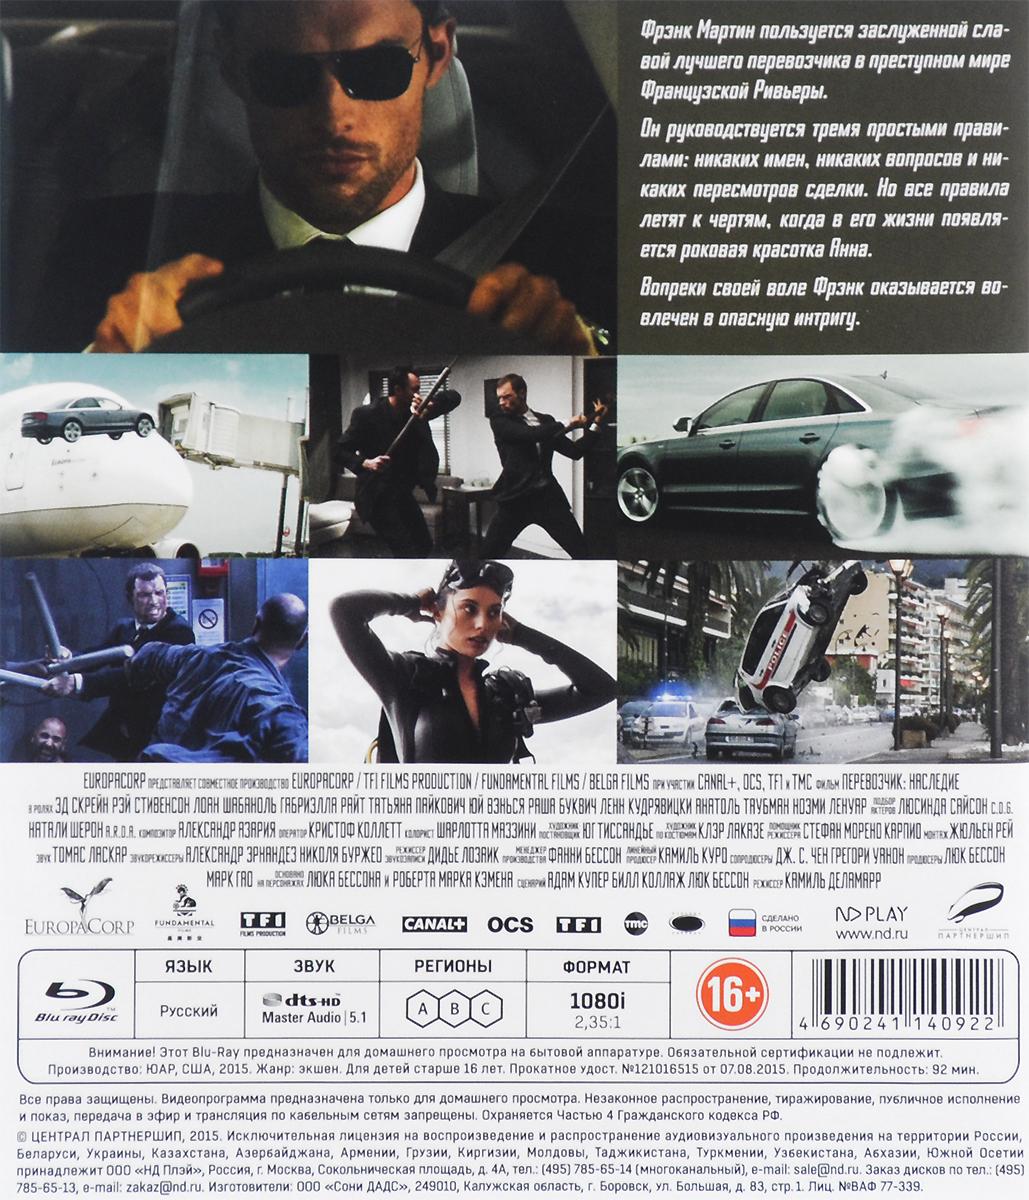 Перевозчик:  Наследие (Blu-ray) EuropaCorp,TF1 Films Productions,Fundamental Films